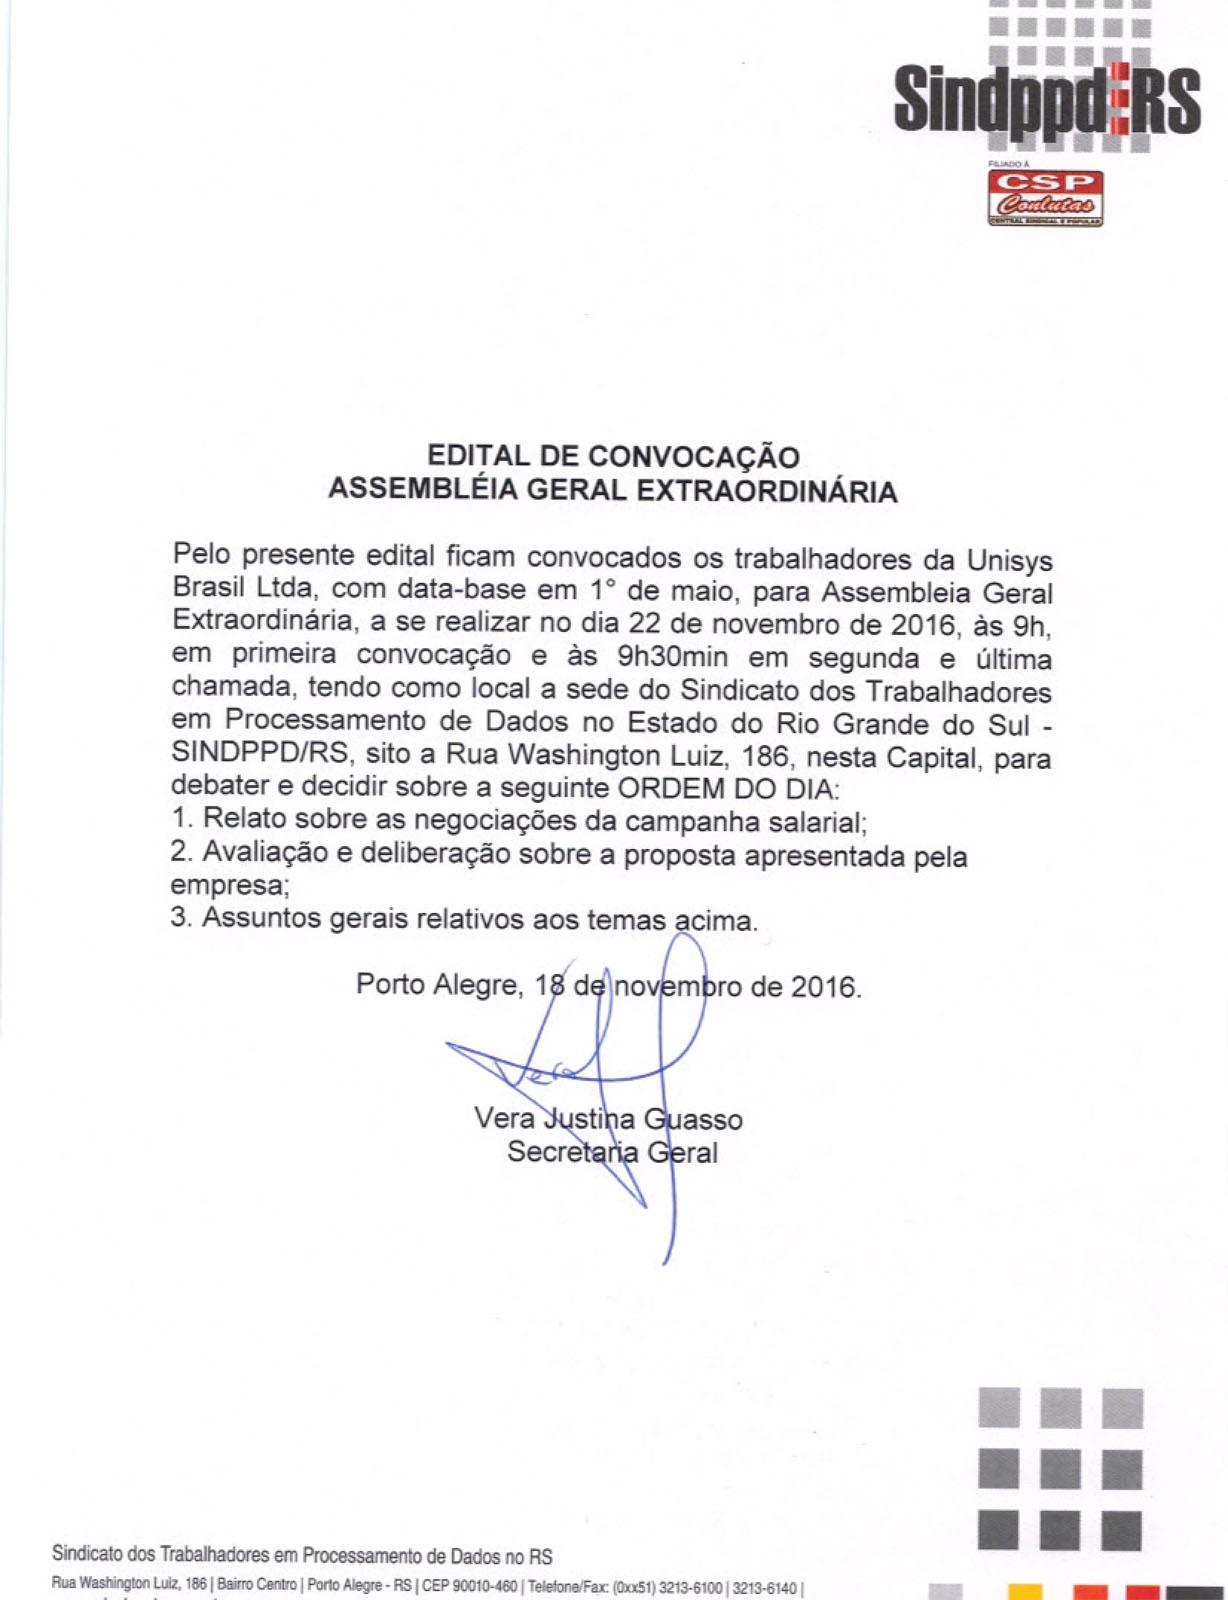 Setor privado assembleia dos trabalhadores da unisys sobre a 161122editalunisysassembleia stopboris Image collections